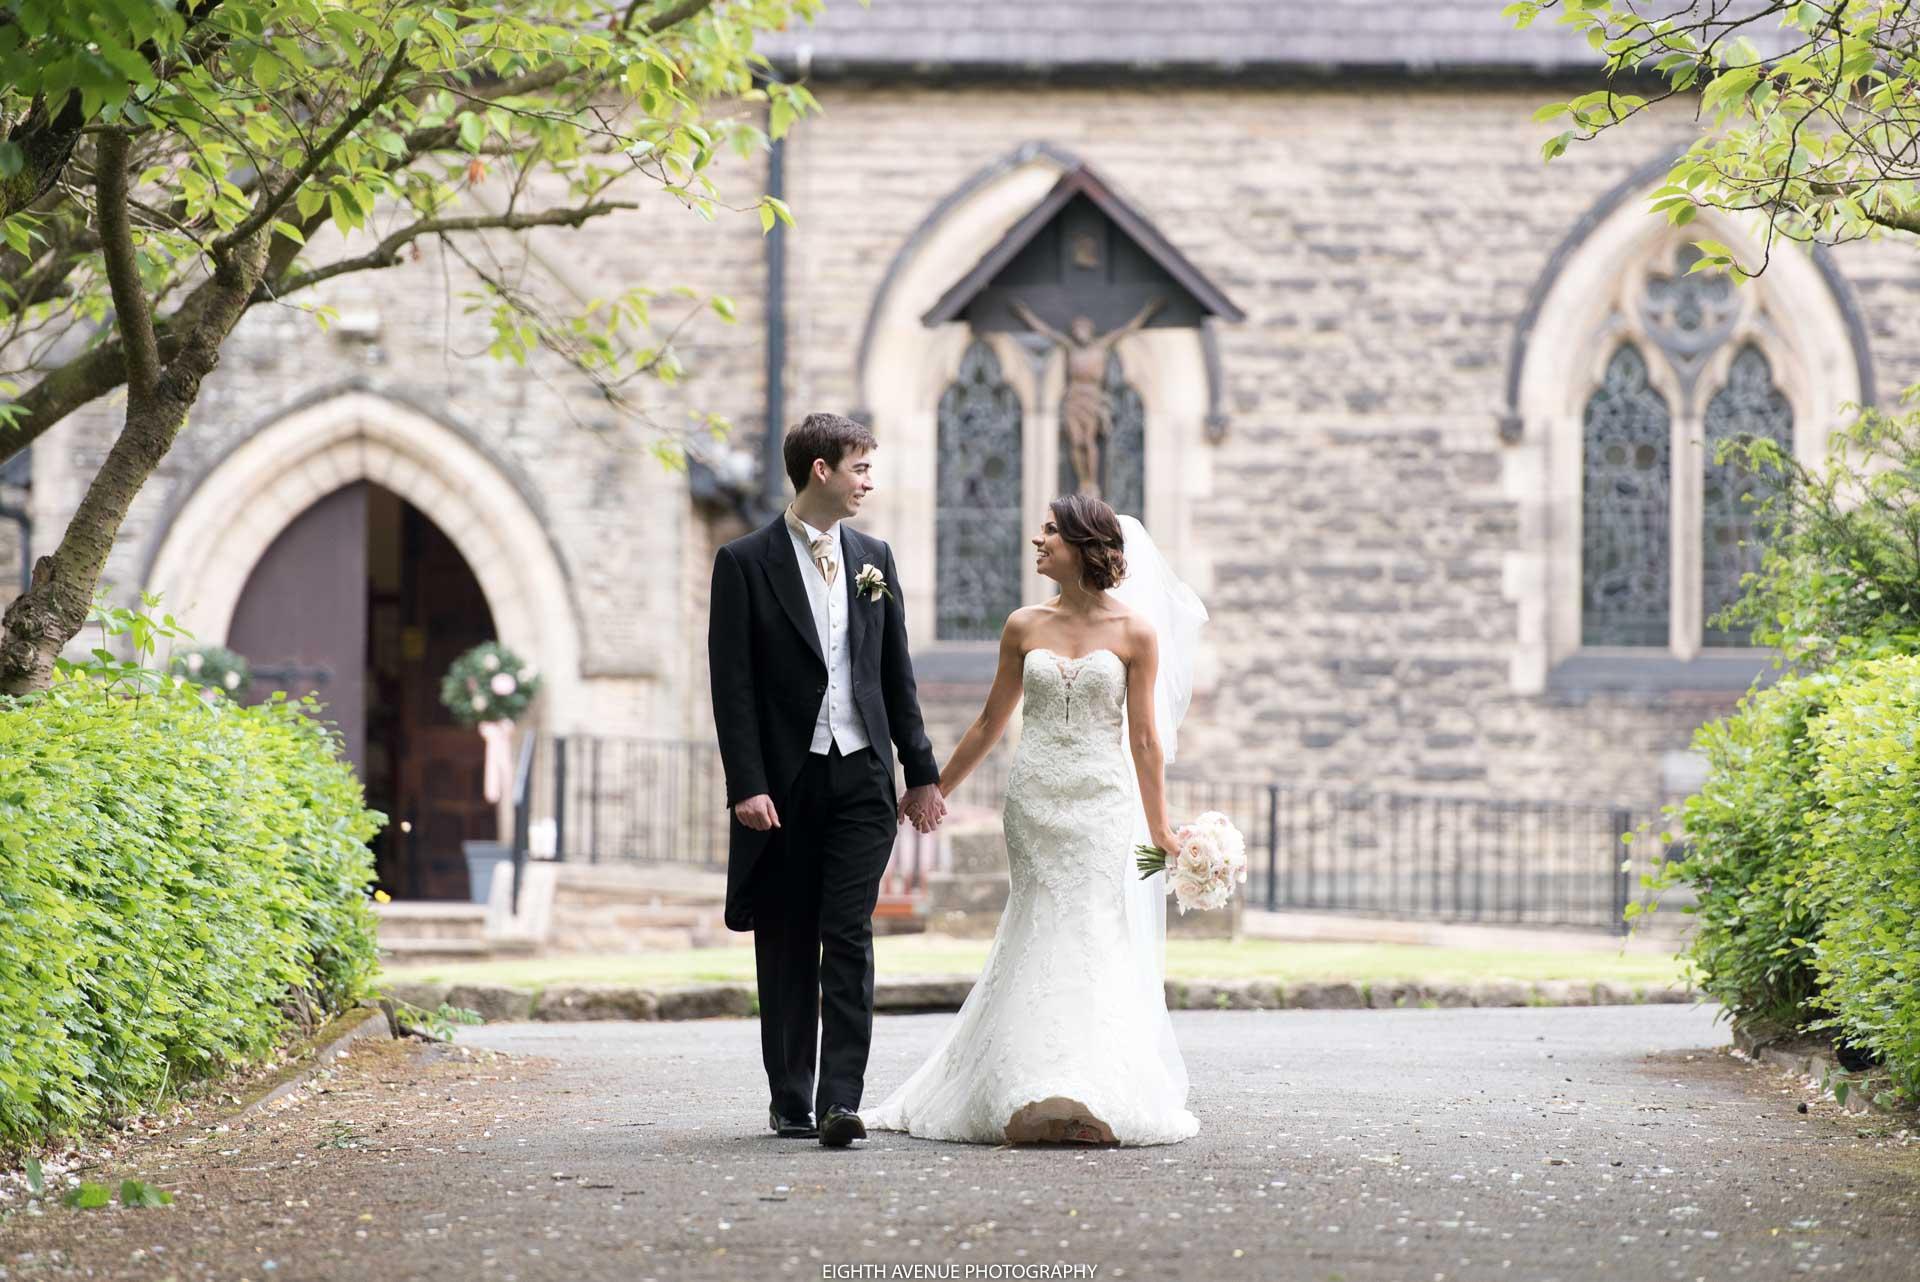 Bride and groom walking away church